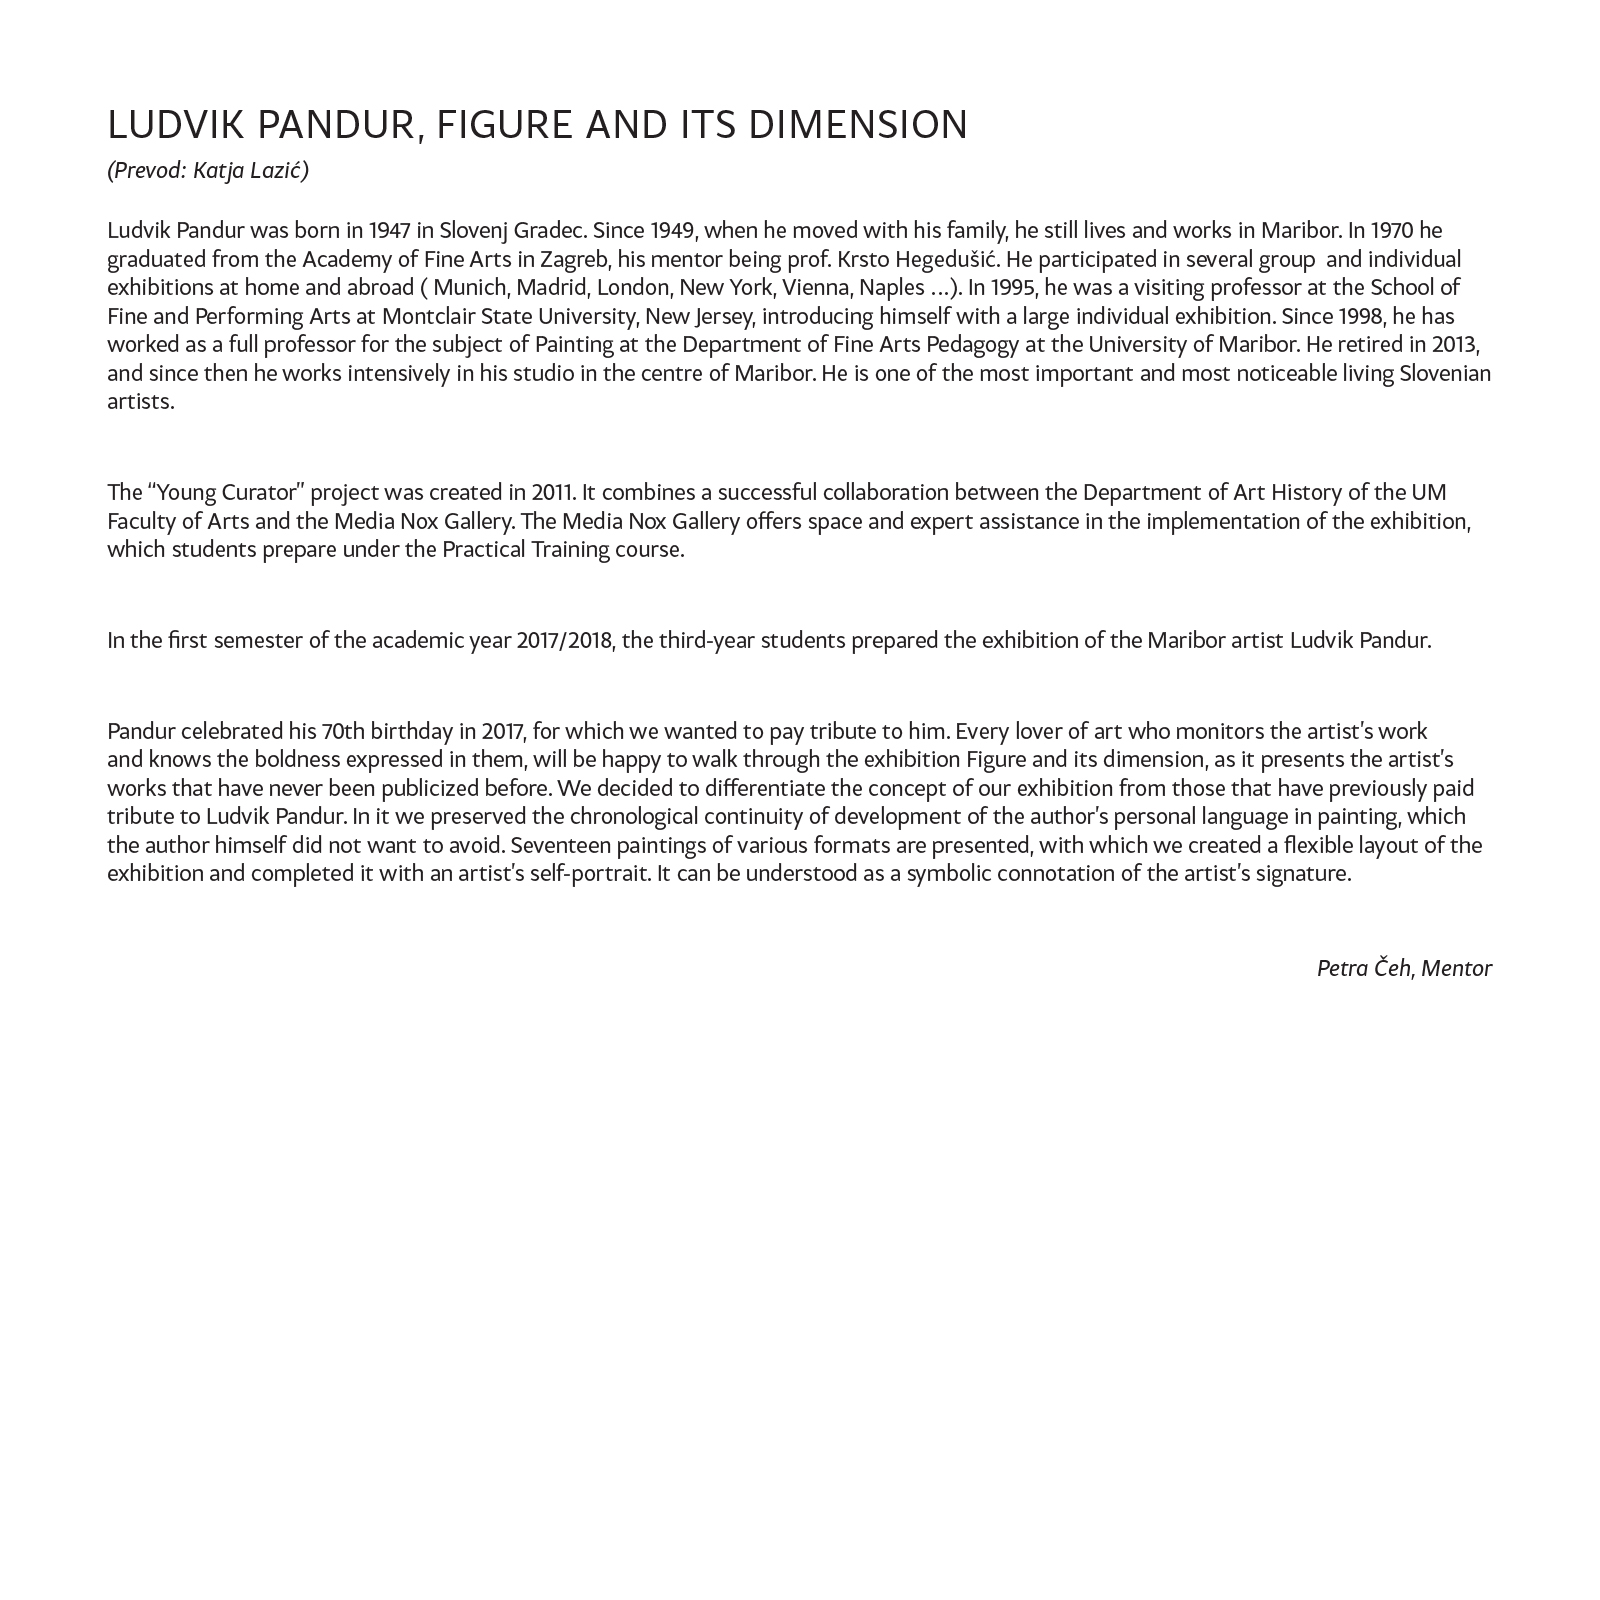 katalog_lp_E_strani-22.jpg